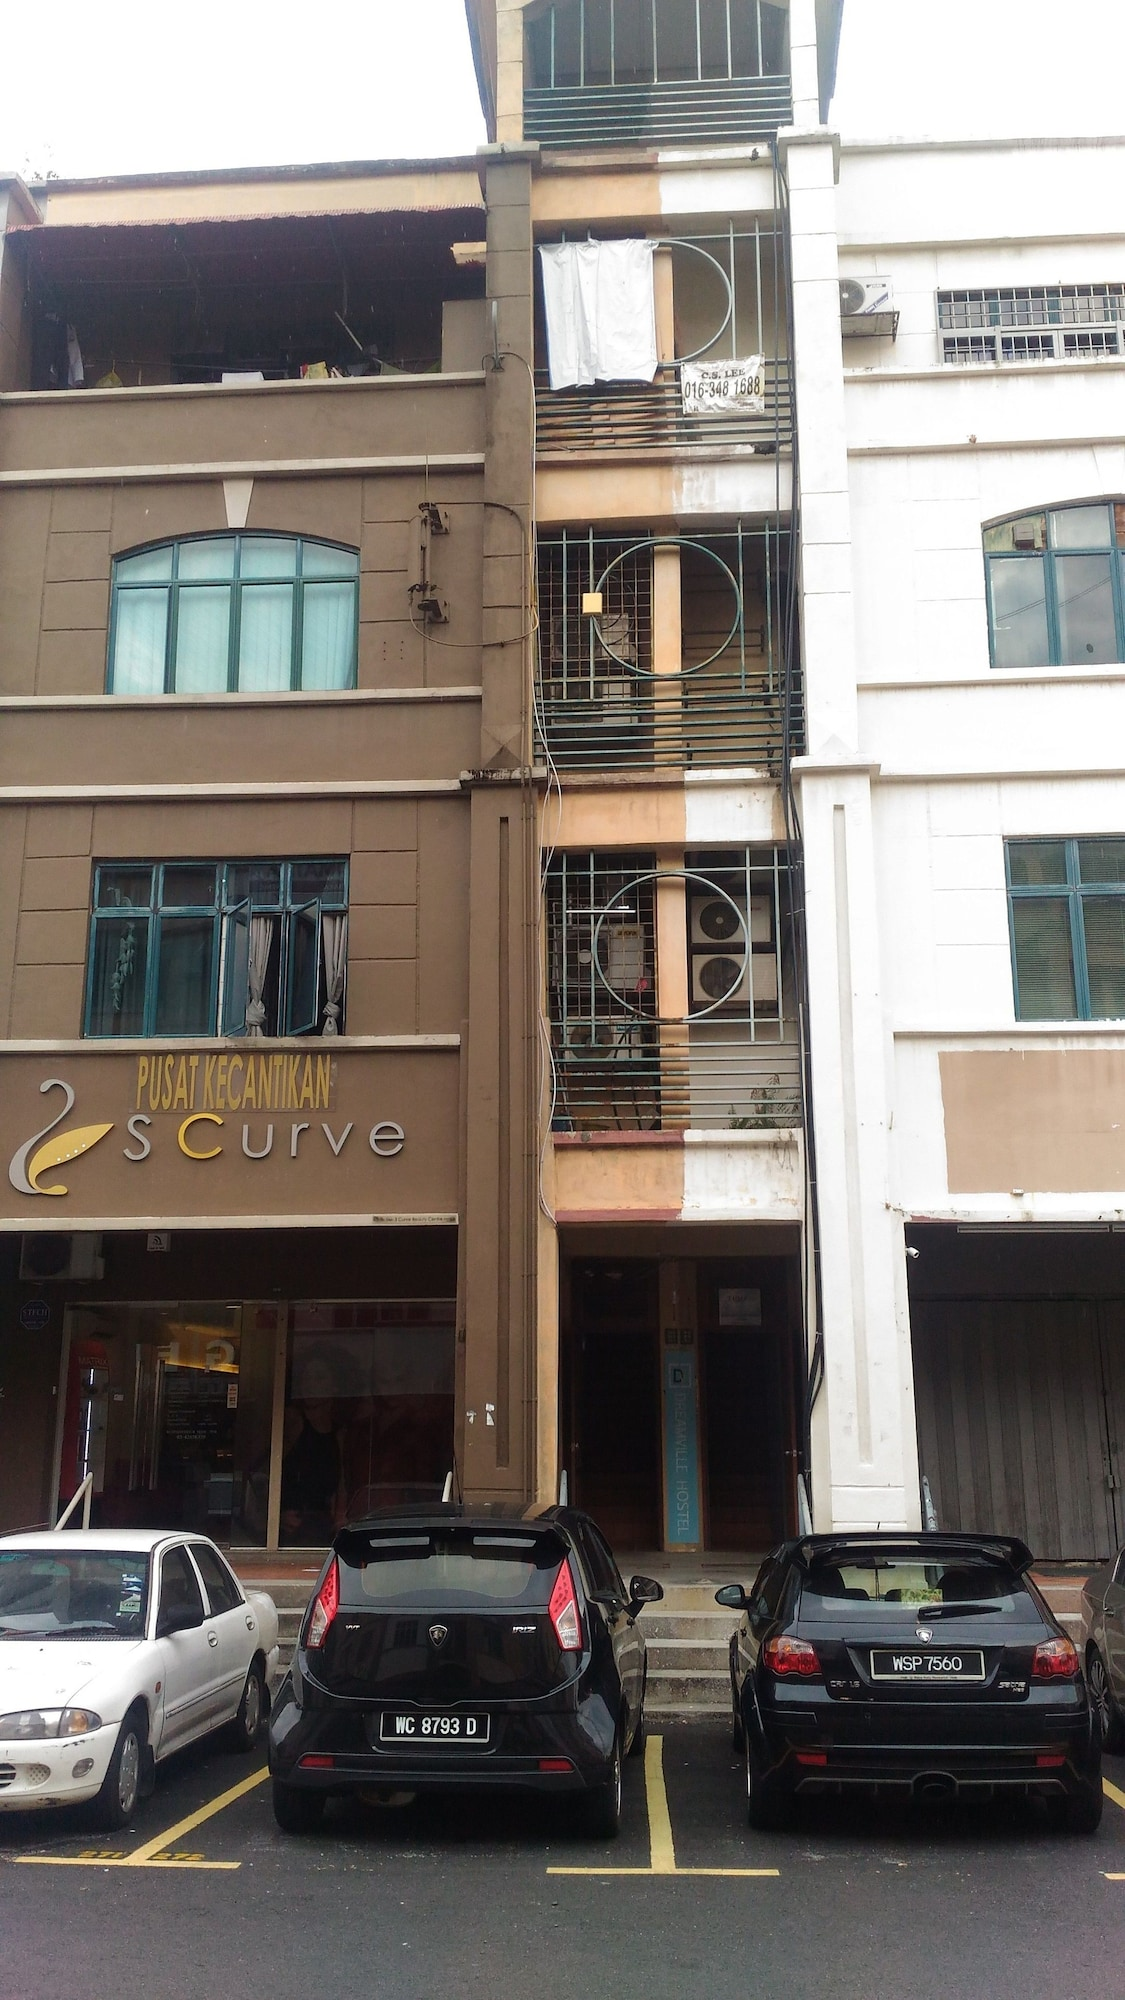 Dreamville Hostel Kuala Lumpur, Kuala Lumpur